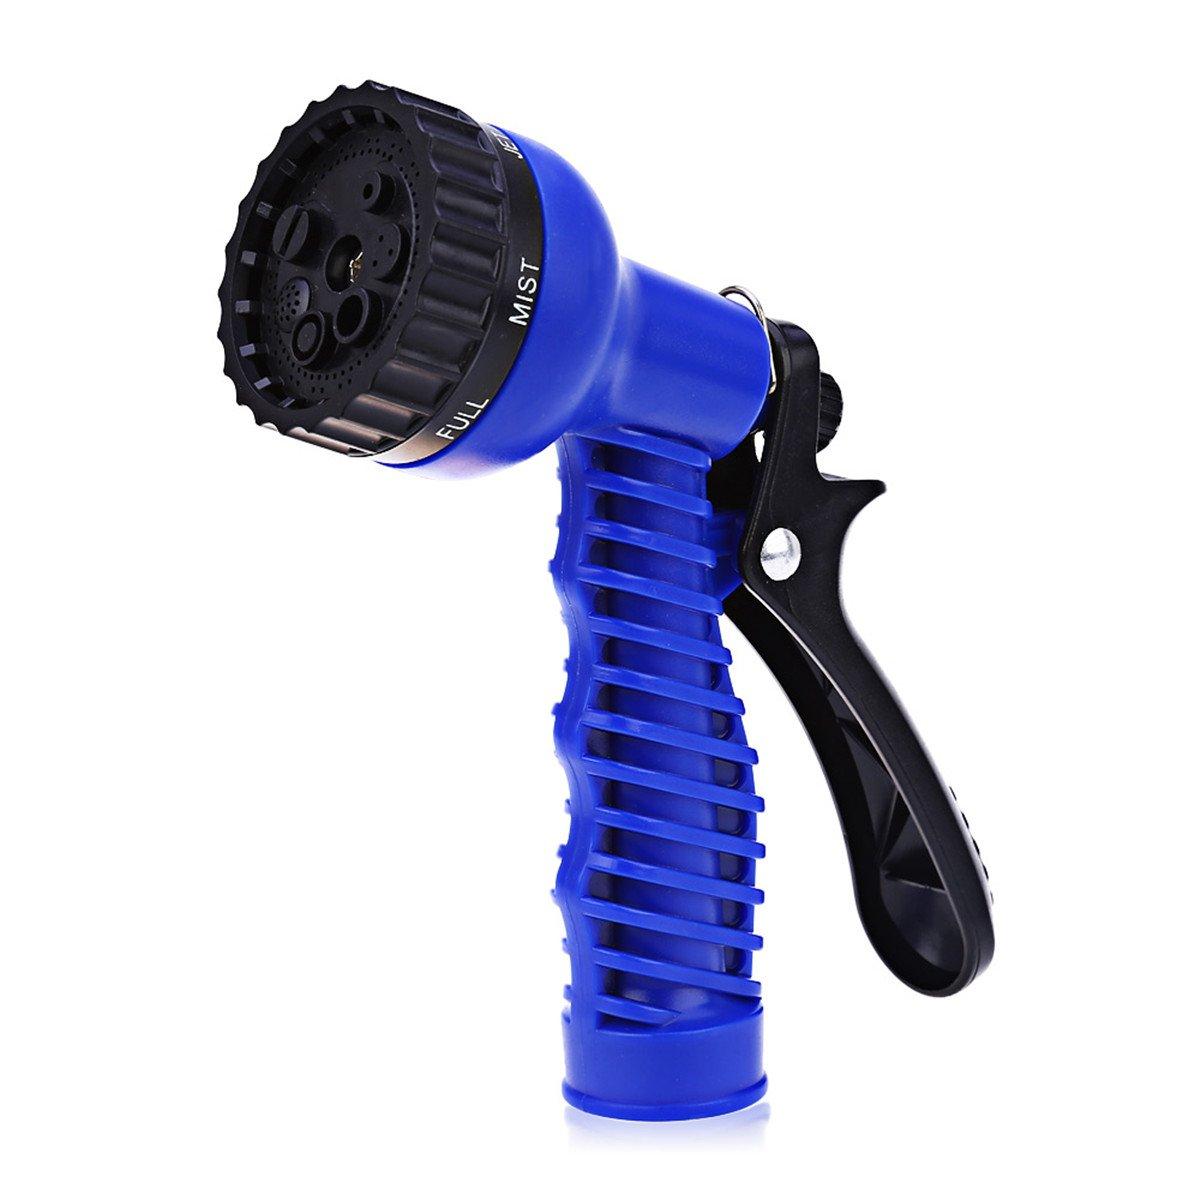 Heavy Duty Garden Hose Nozzle Sprayer High Pressure,7 Adjustable Watering Patterns Watering Nozzle Hose Spray Gun for Car Wash Cleaning Lawn Garden Watering